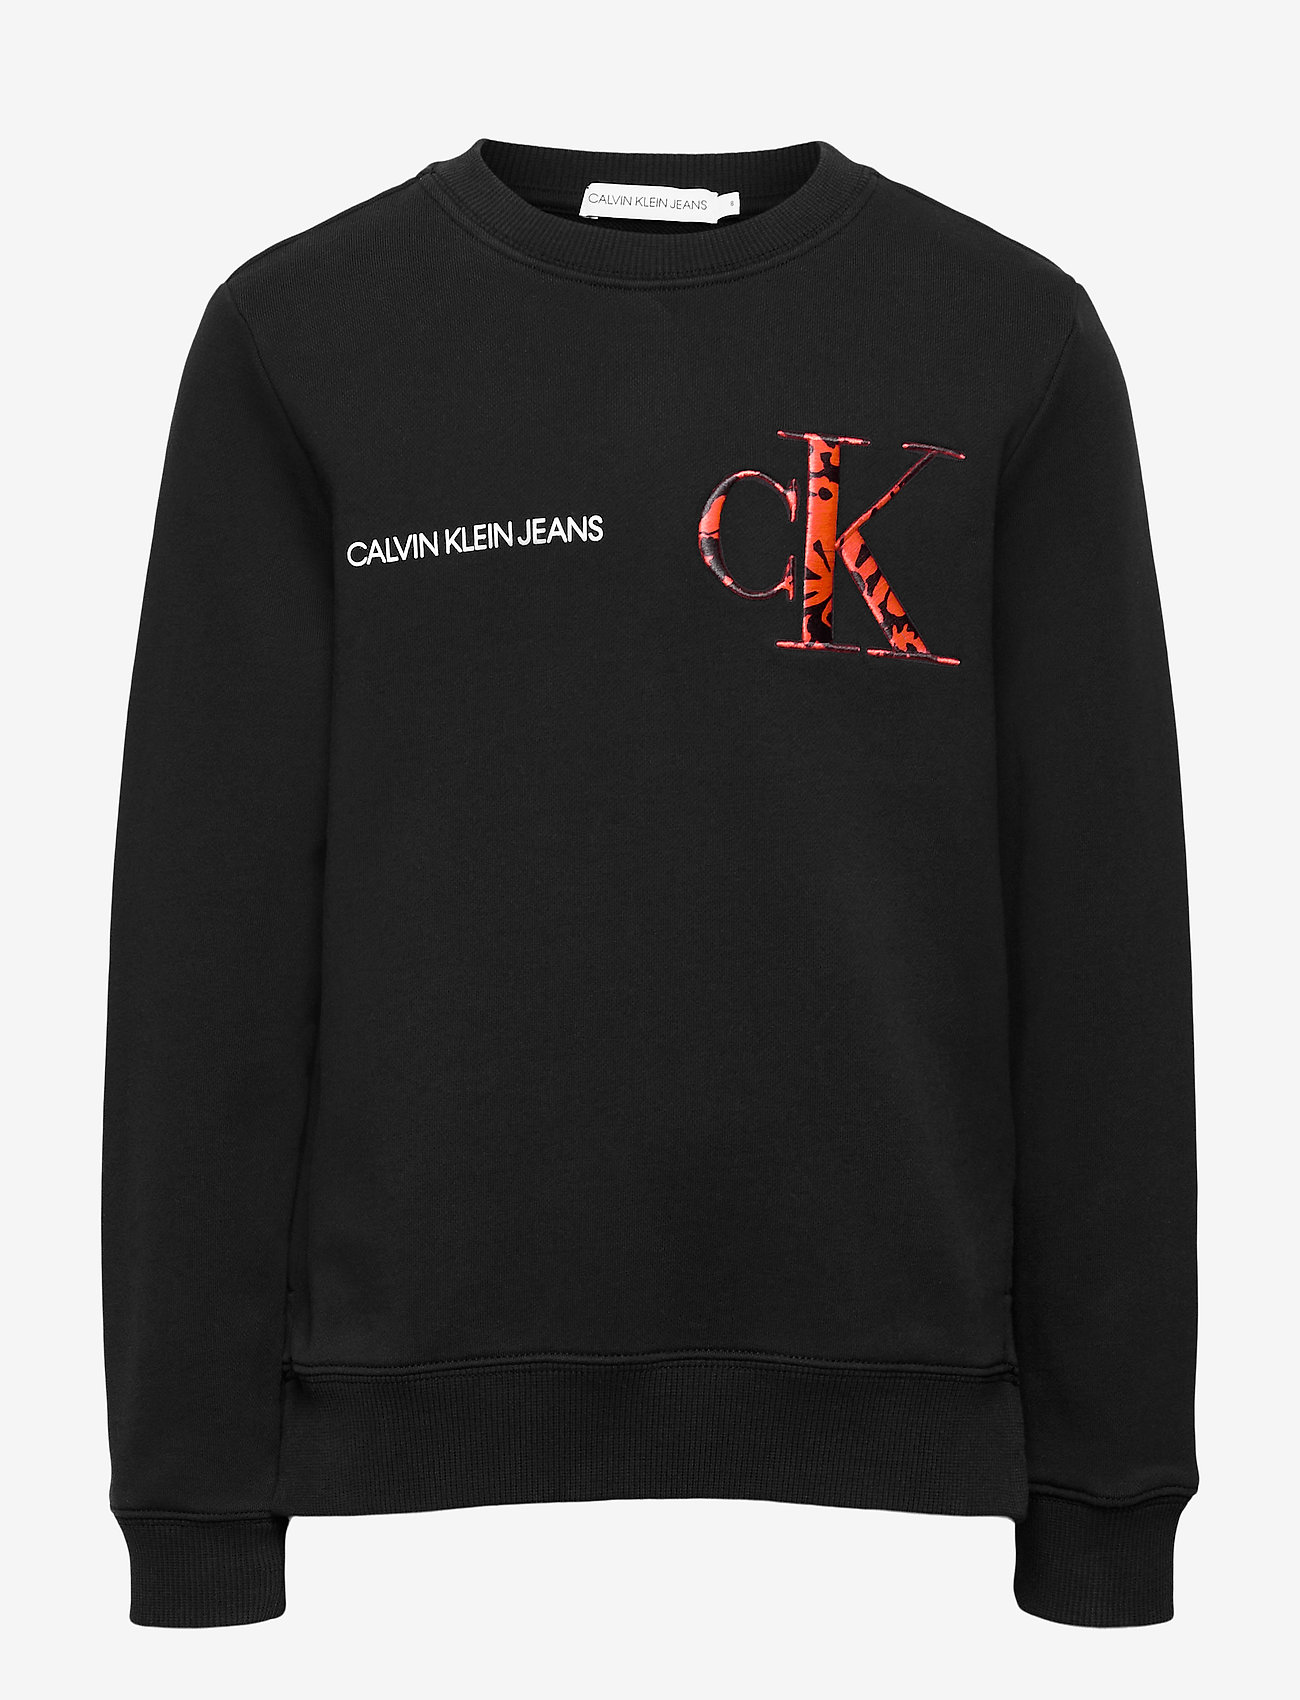 Calvin Klein - RAISED MONOGRAM SWEATSHIRT - sweatshirts - ck black - 0